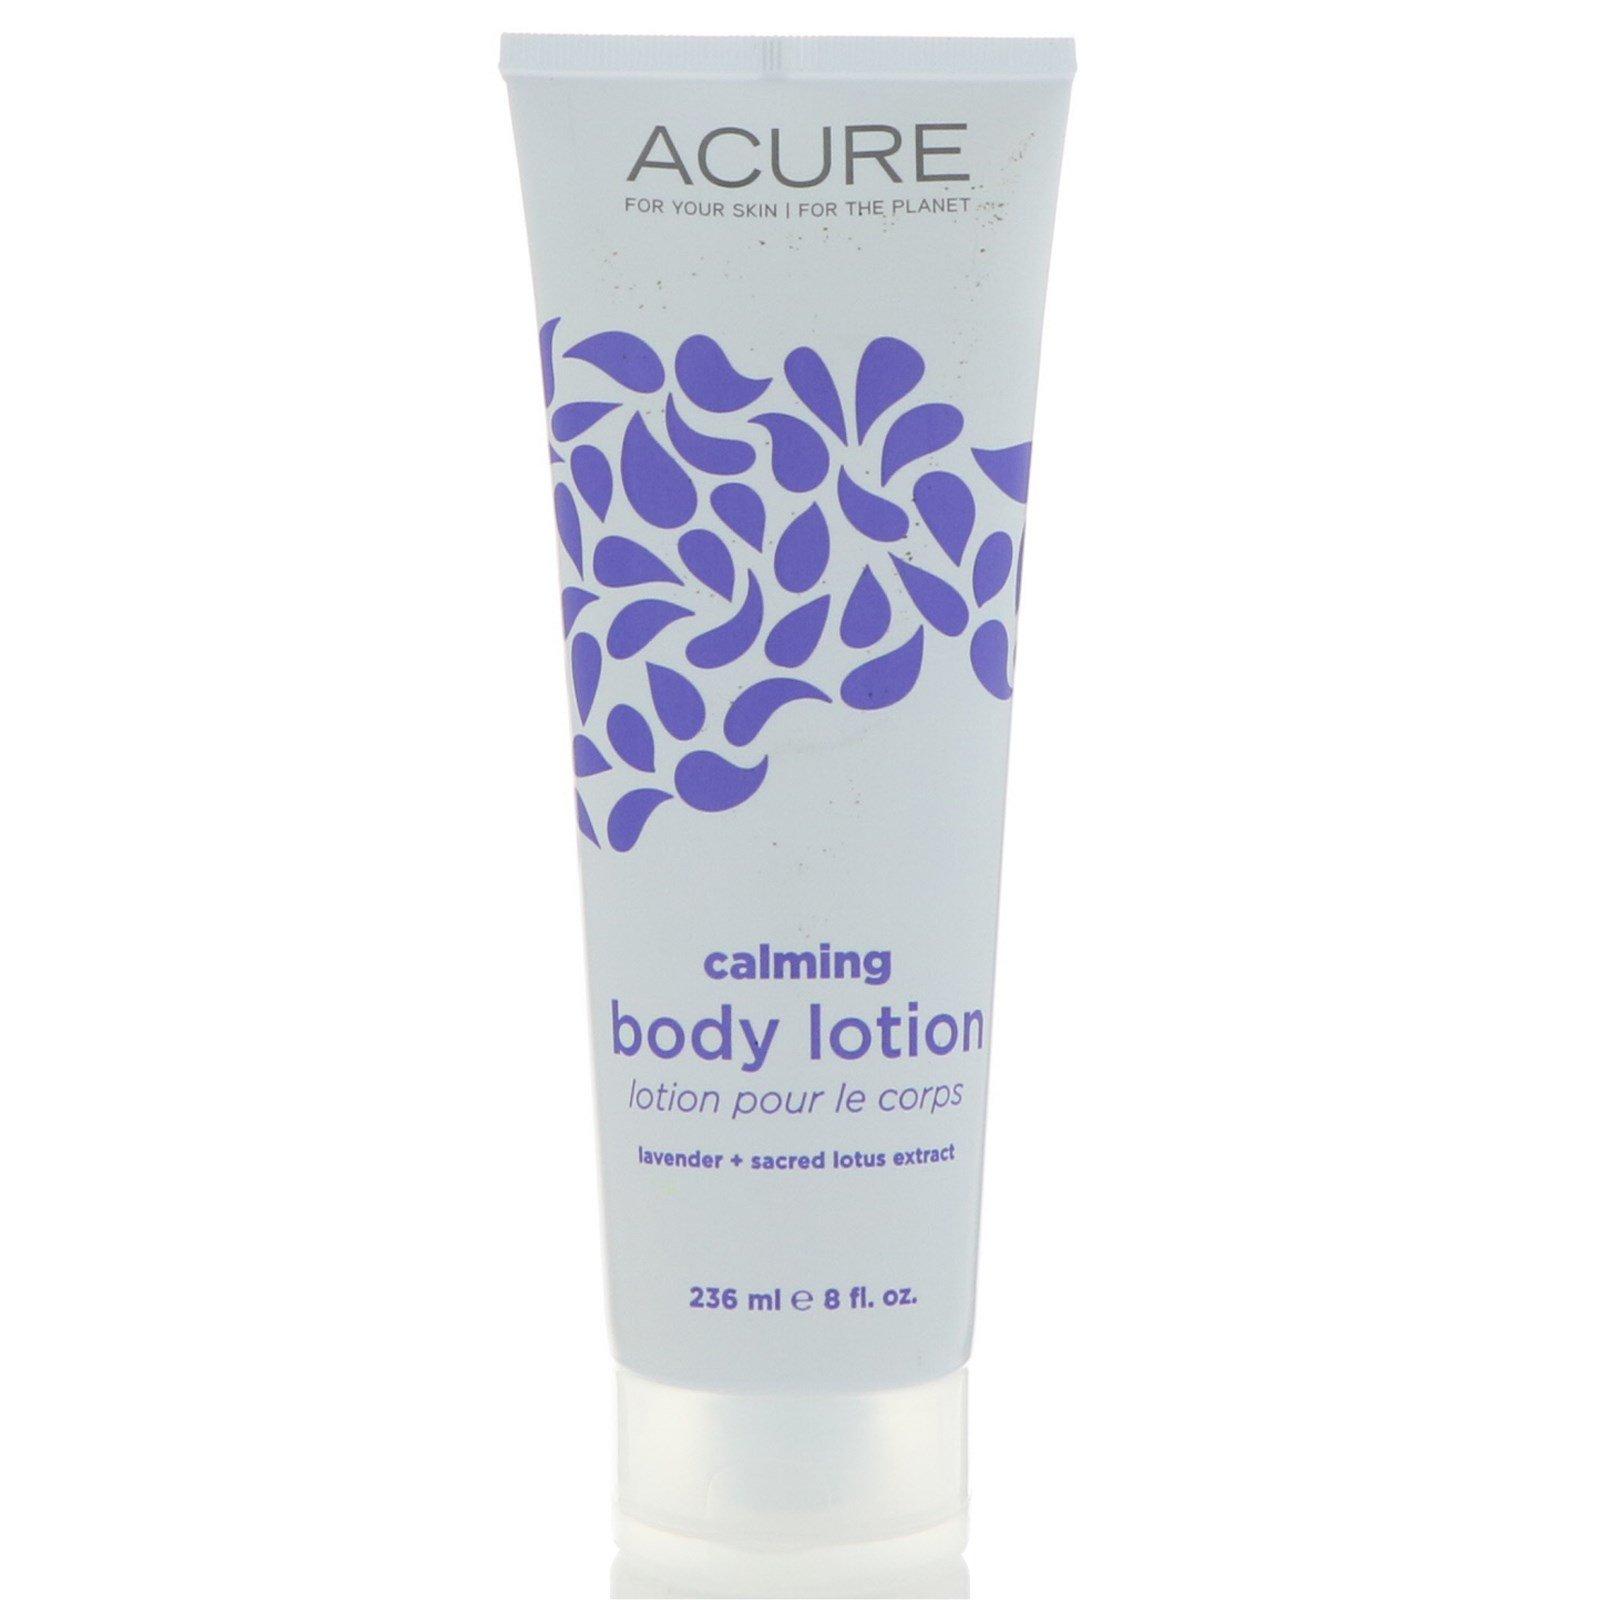 Acure Organics, Успокаивающий лосьон для тела, лаванда + экстракт лотоса, 8 ж. унц.(236 мл)